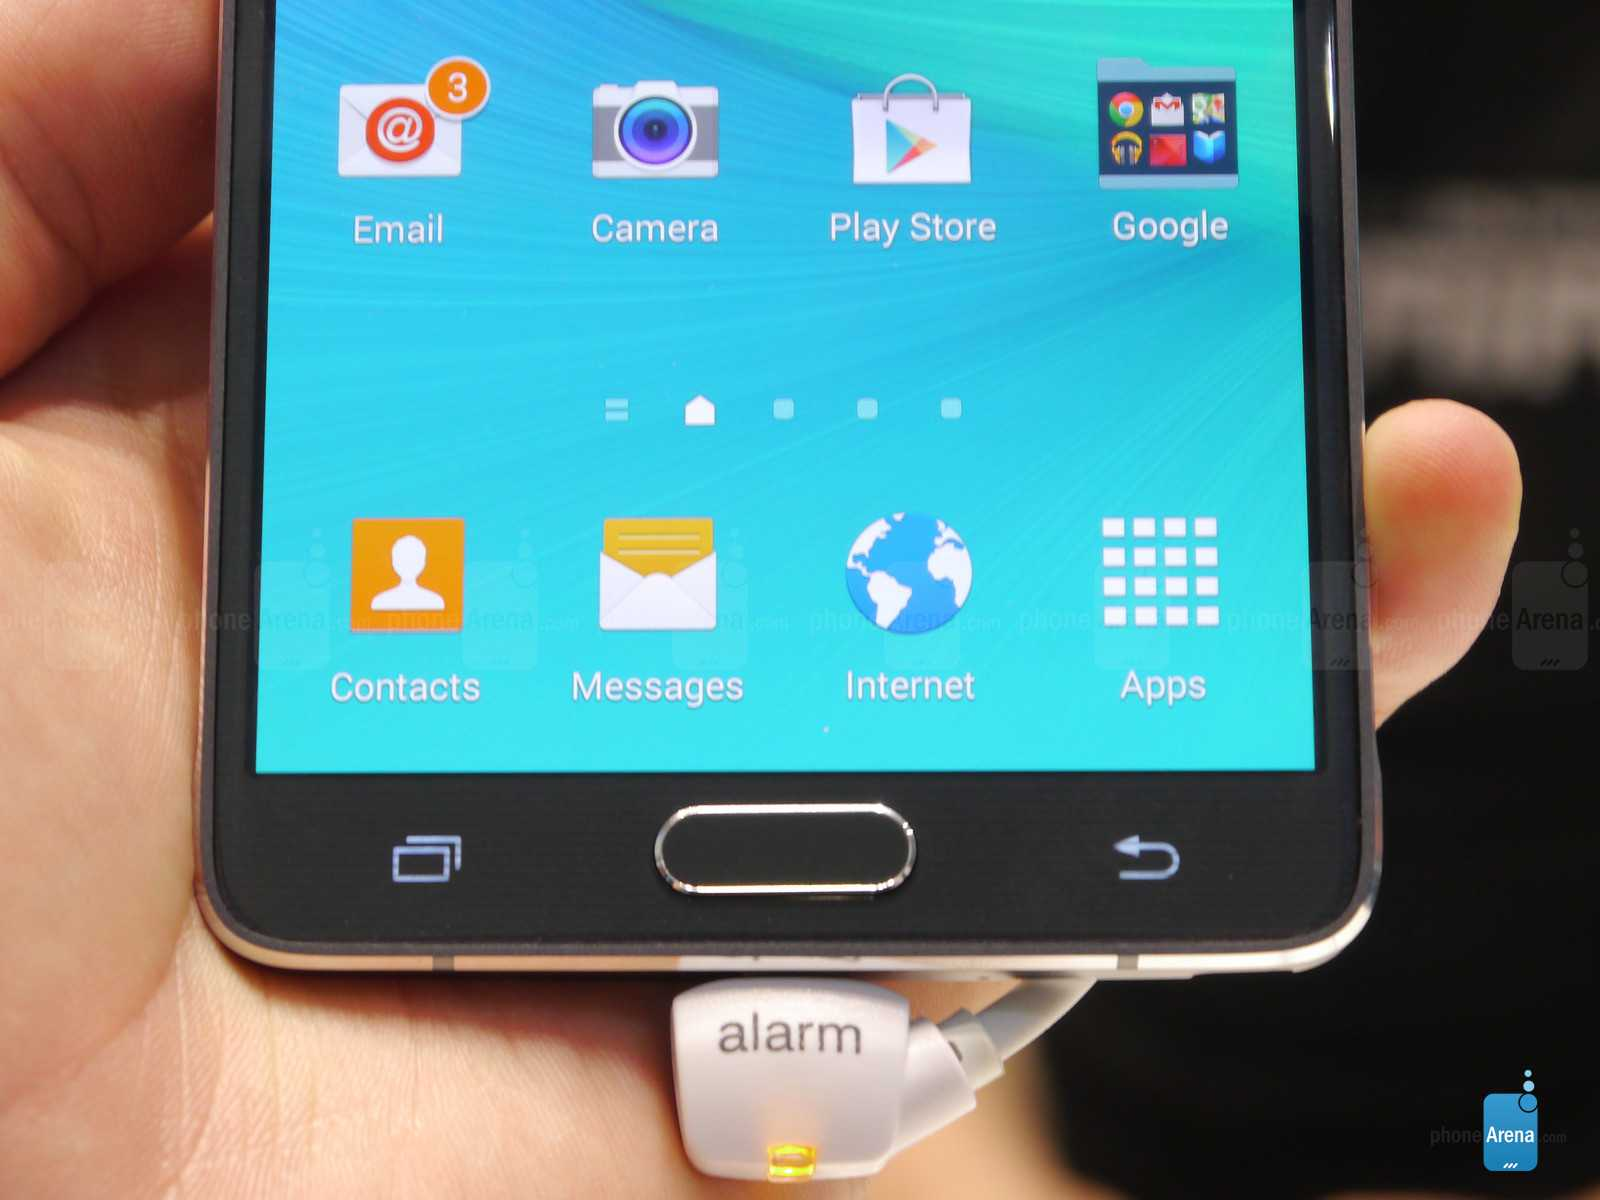 Fingerprint-scanner-in-the-home-button